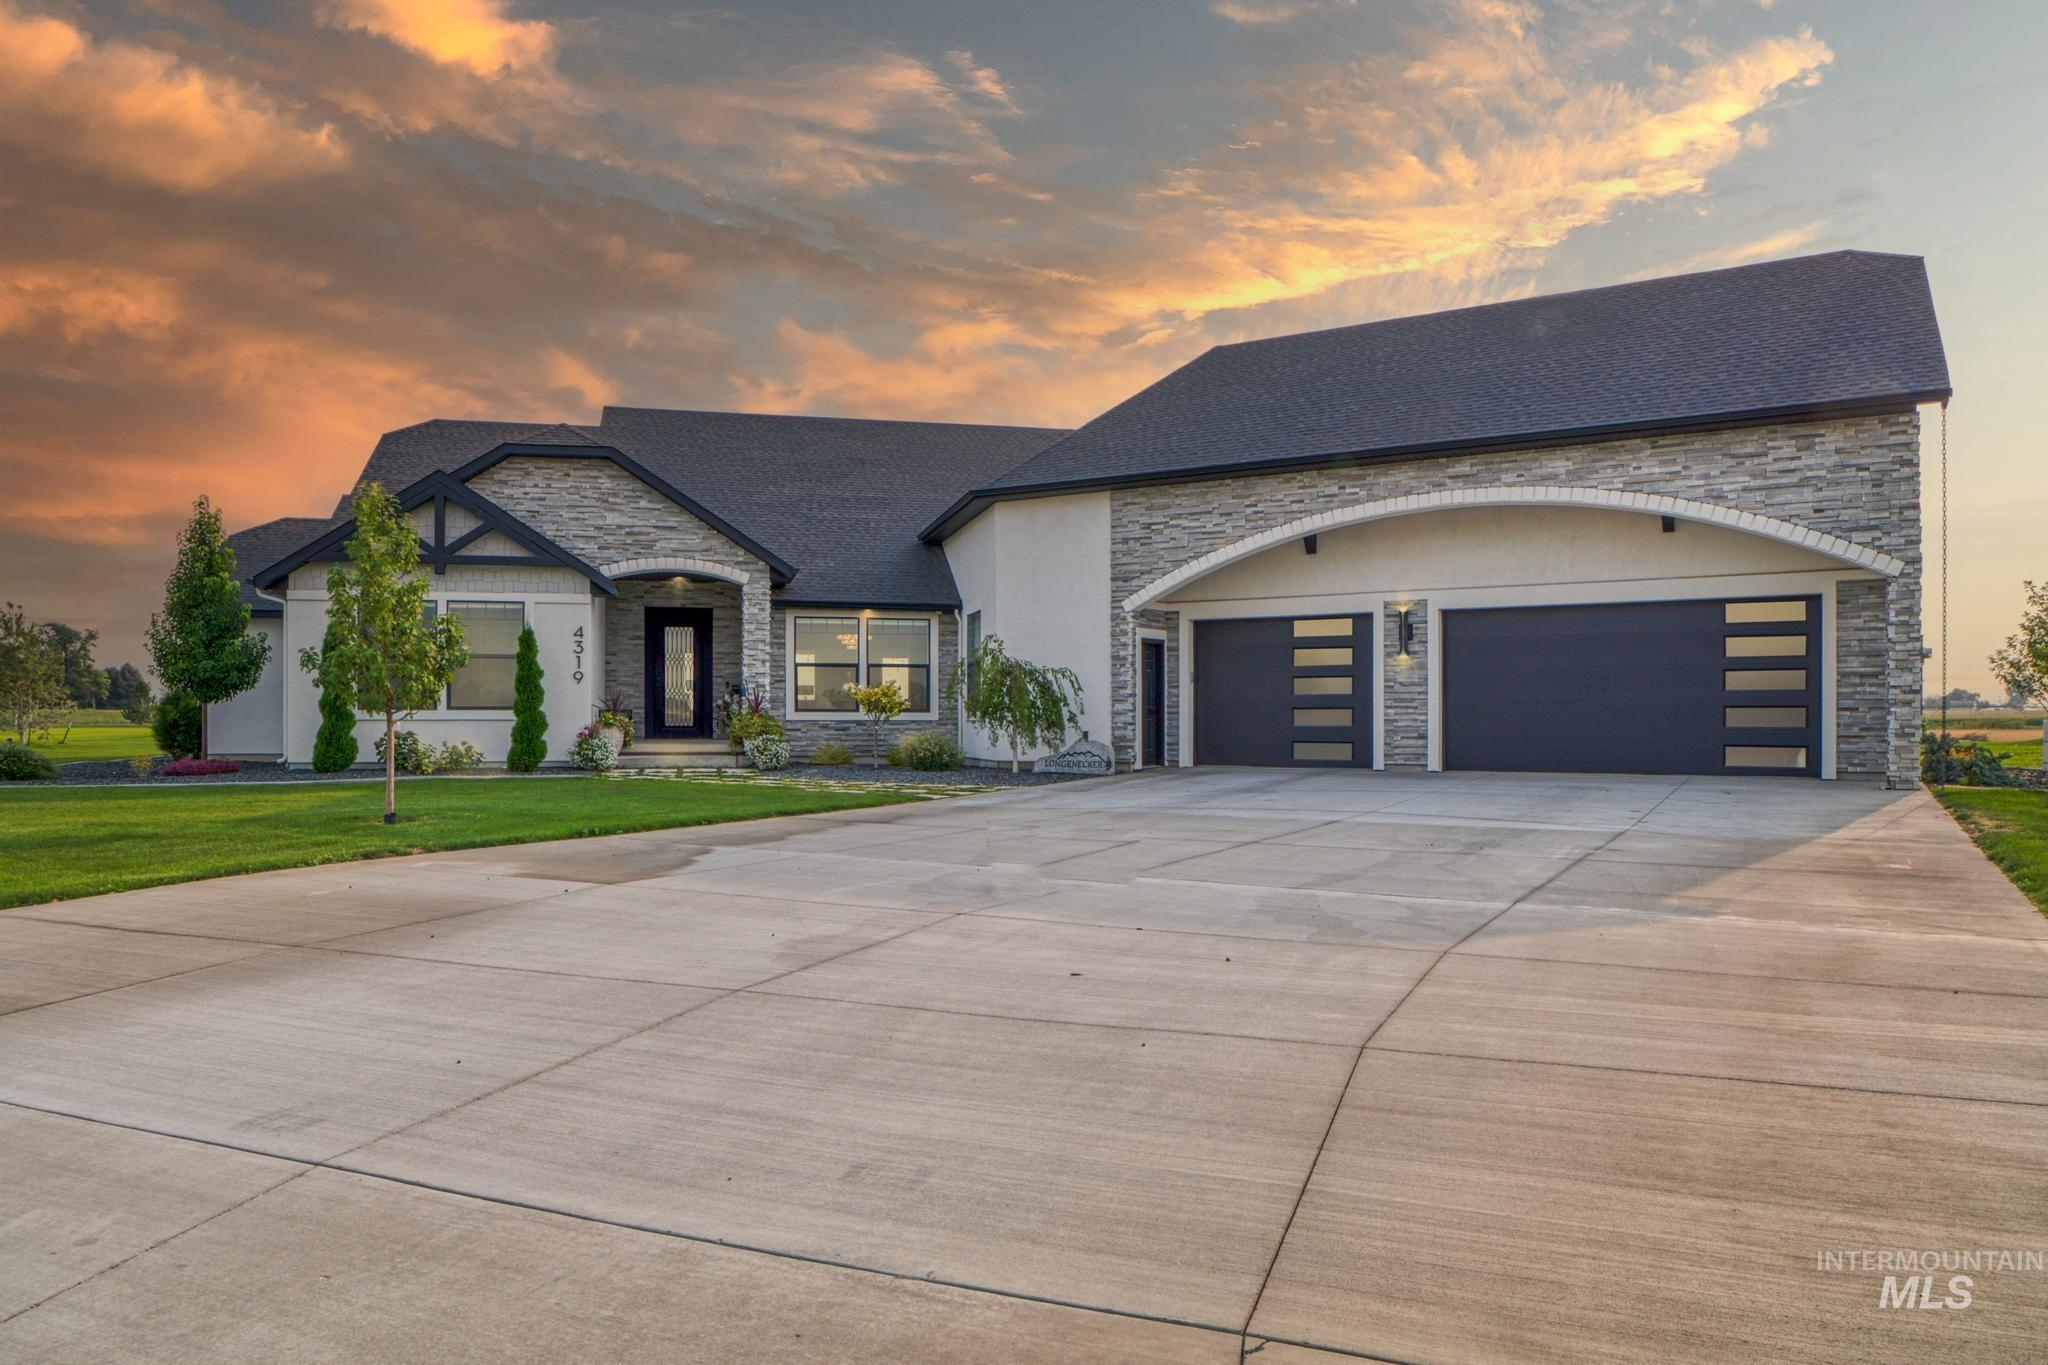 4319 N 2575 E Property Photo